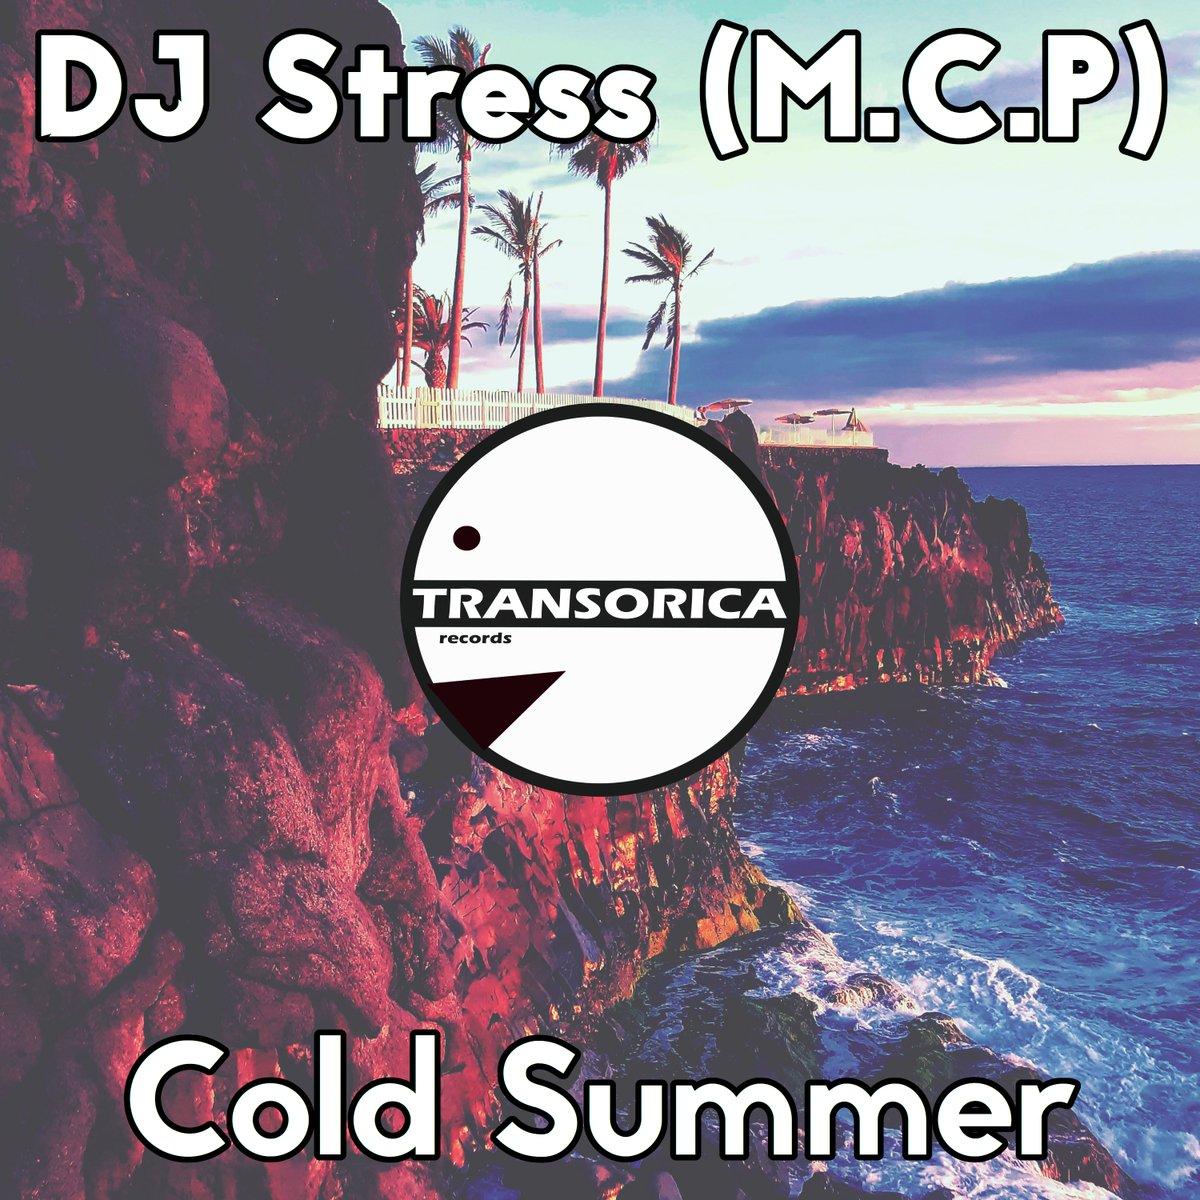 Transorica Records presents DJ Stress (M.C.P) - Cold Summer (Single).  https://t.co/jTCfXHhZiQ #Transorica #TranceFamily #EDM #TranceMusic #EDMFamily #Progressive #ProgressiveTrance #Uplifting #ClubMusic #ElectronicMusic #MusicLovers #TranceWorld #Spotify https://t.co/Fhwc28RPDI